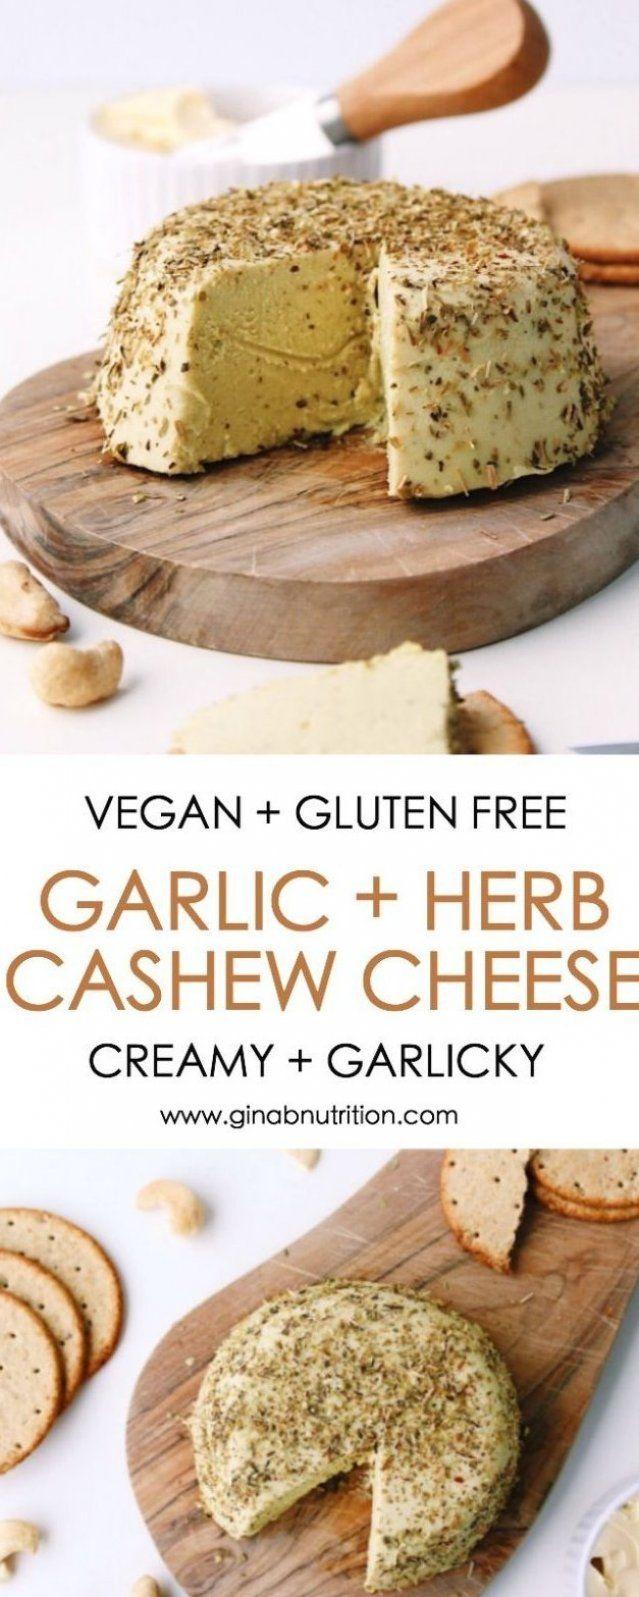 Untitled In 2020 Cashew Cheese Vegan Cheese Recipes Vegan Cheese